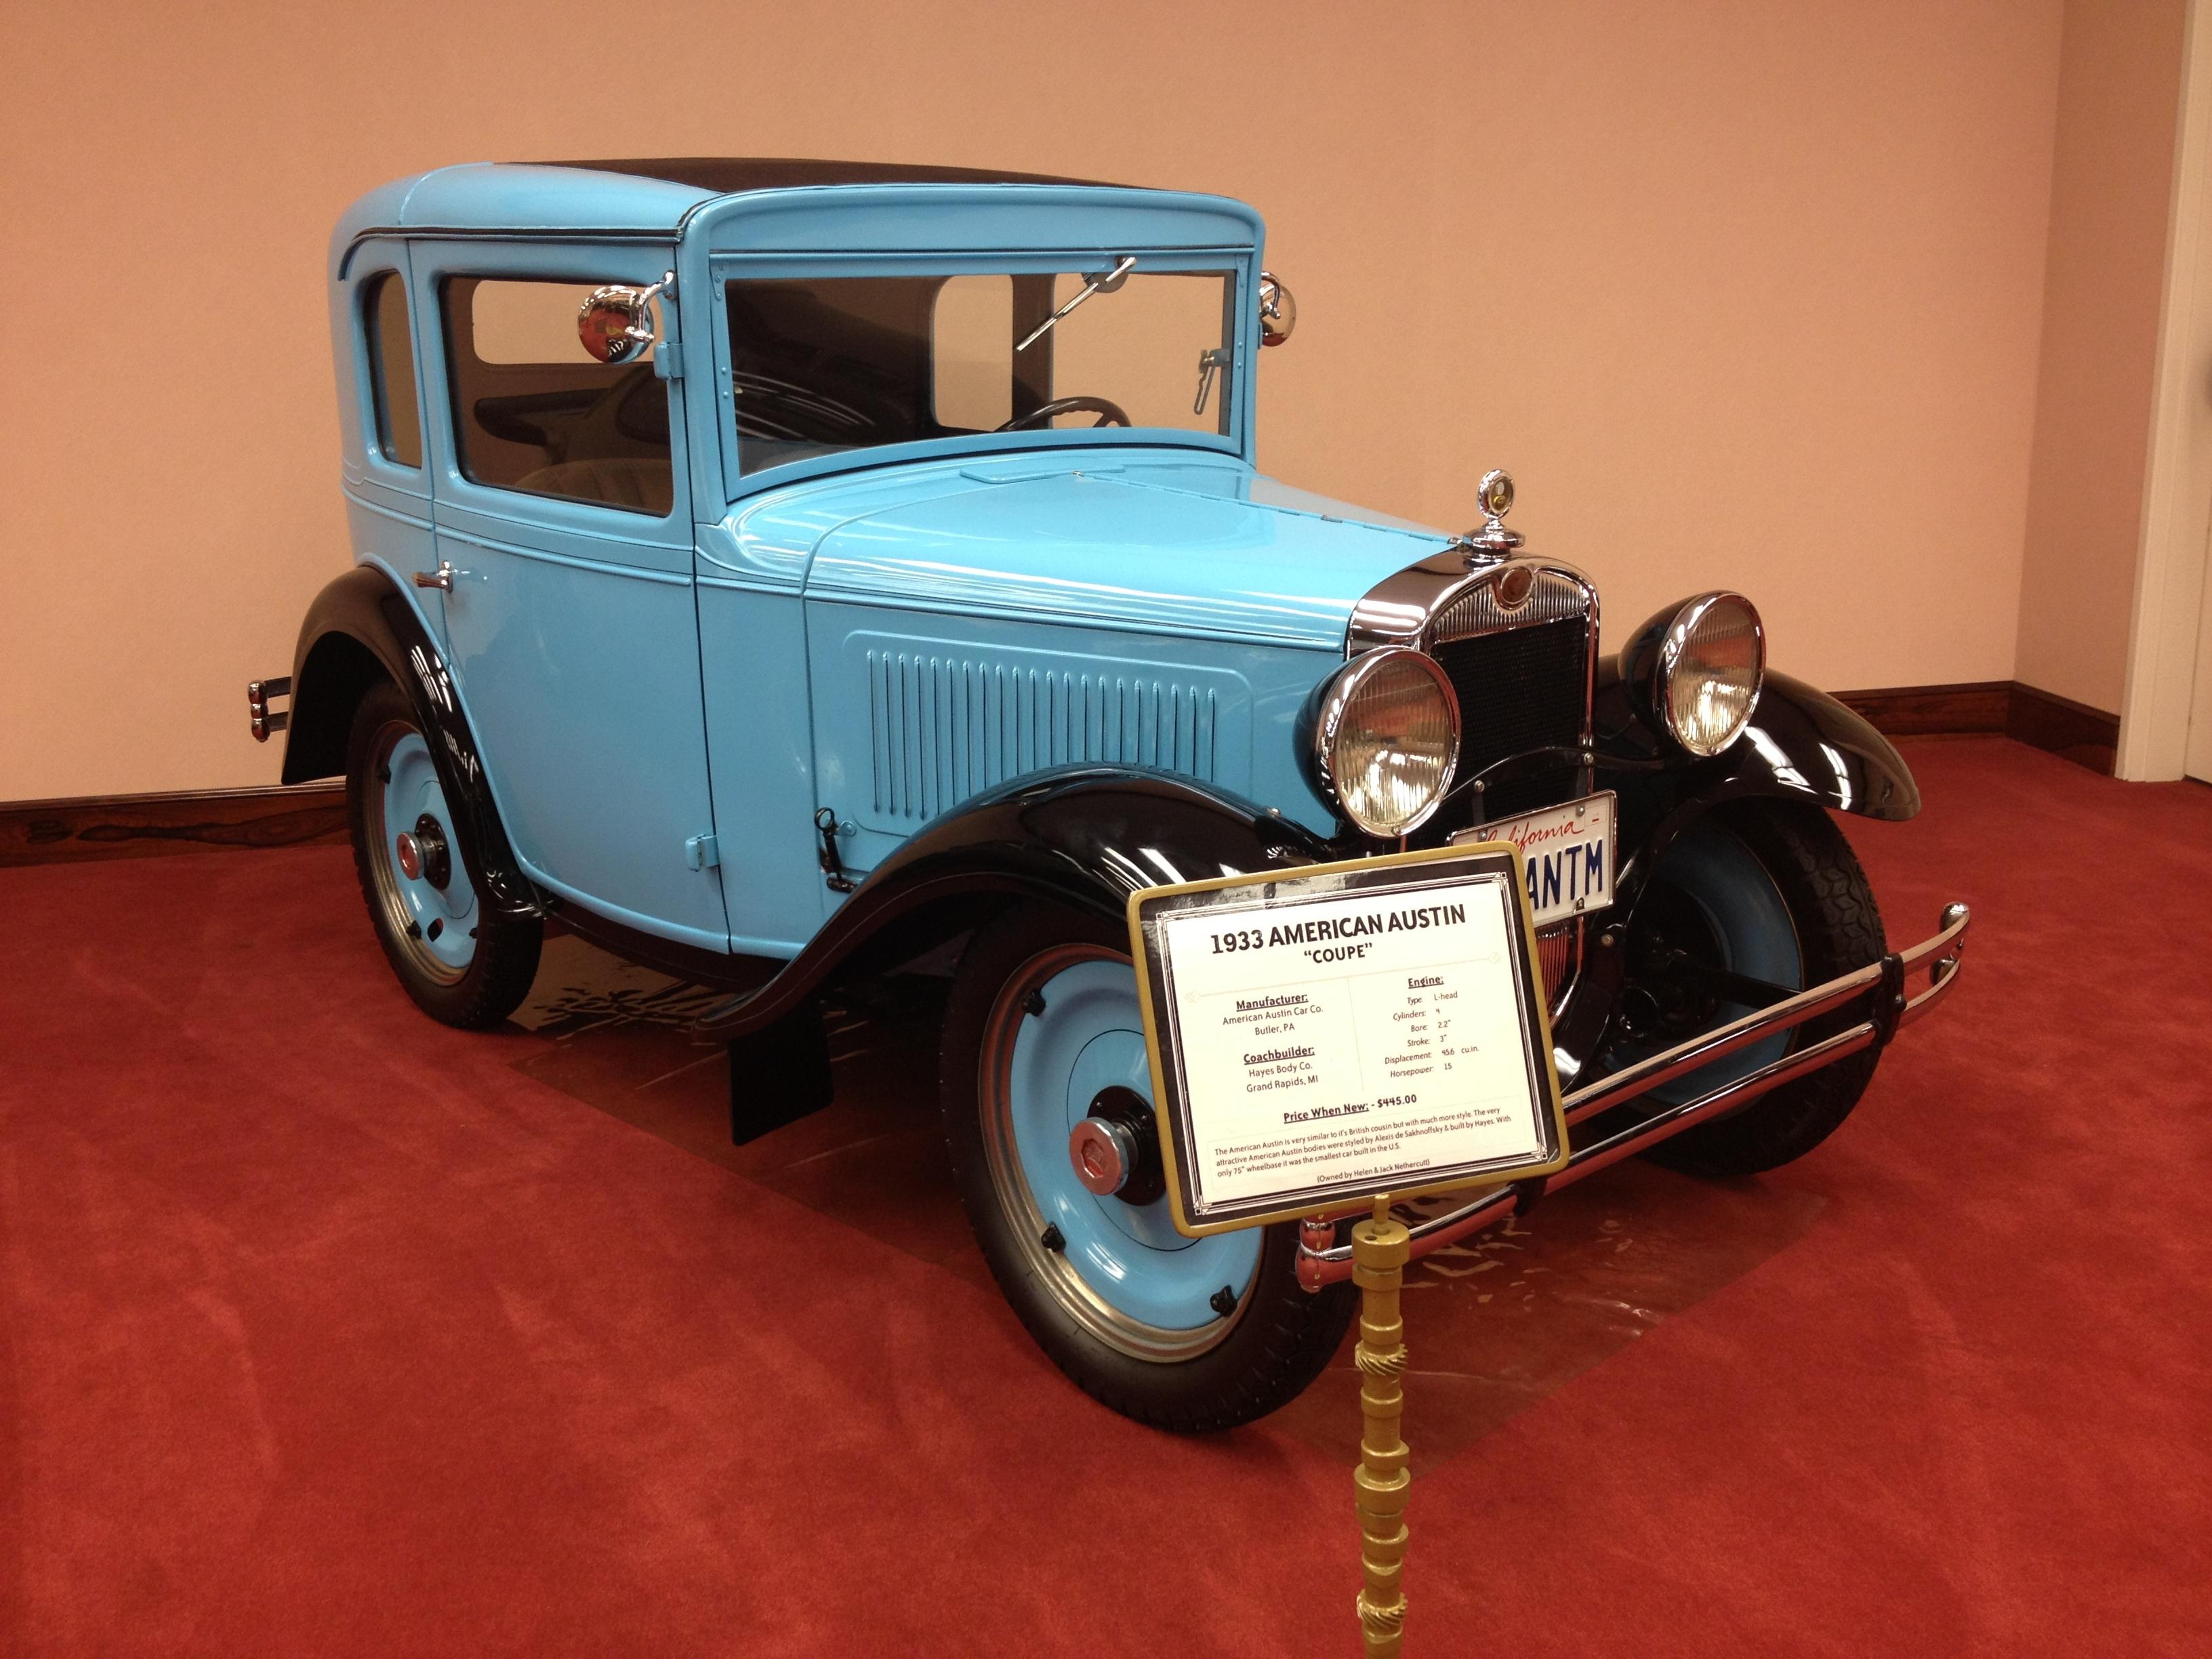 Free Images : old, jeep, auto, blue, motor vehicle, vintage car ...